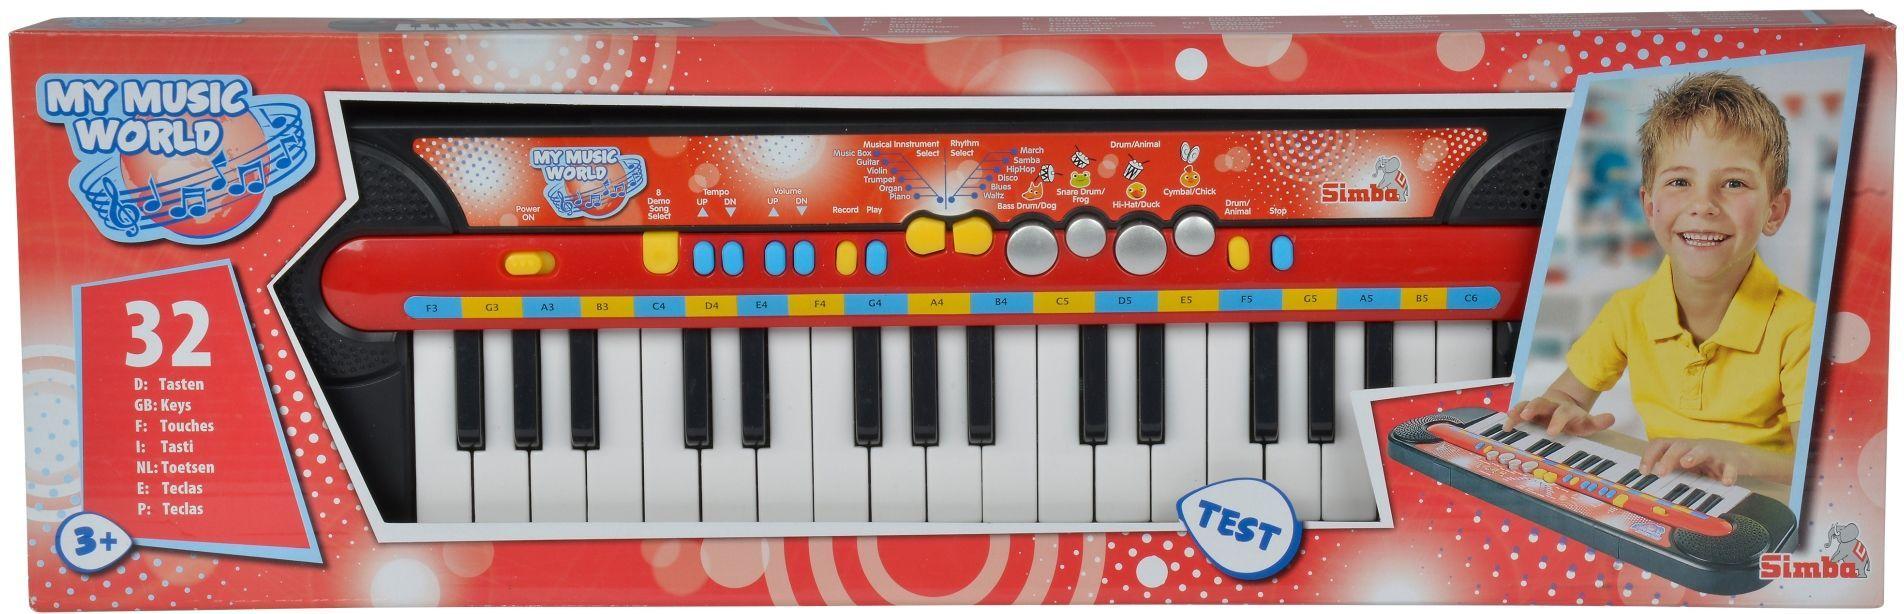 Детска йоника Simba Toys - My Music World - 4